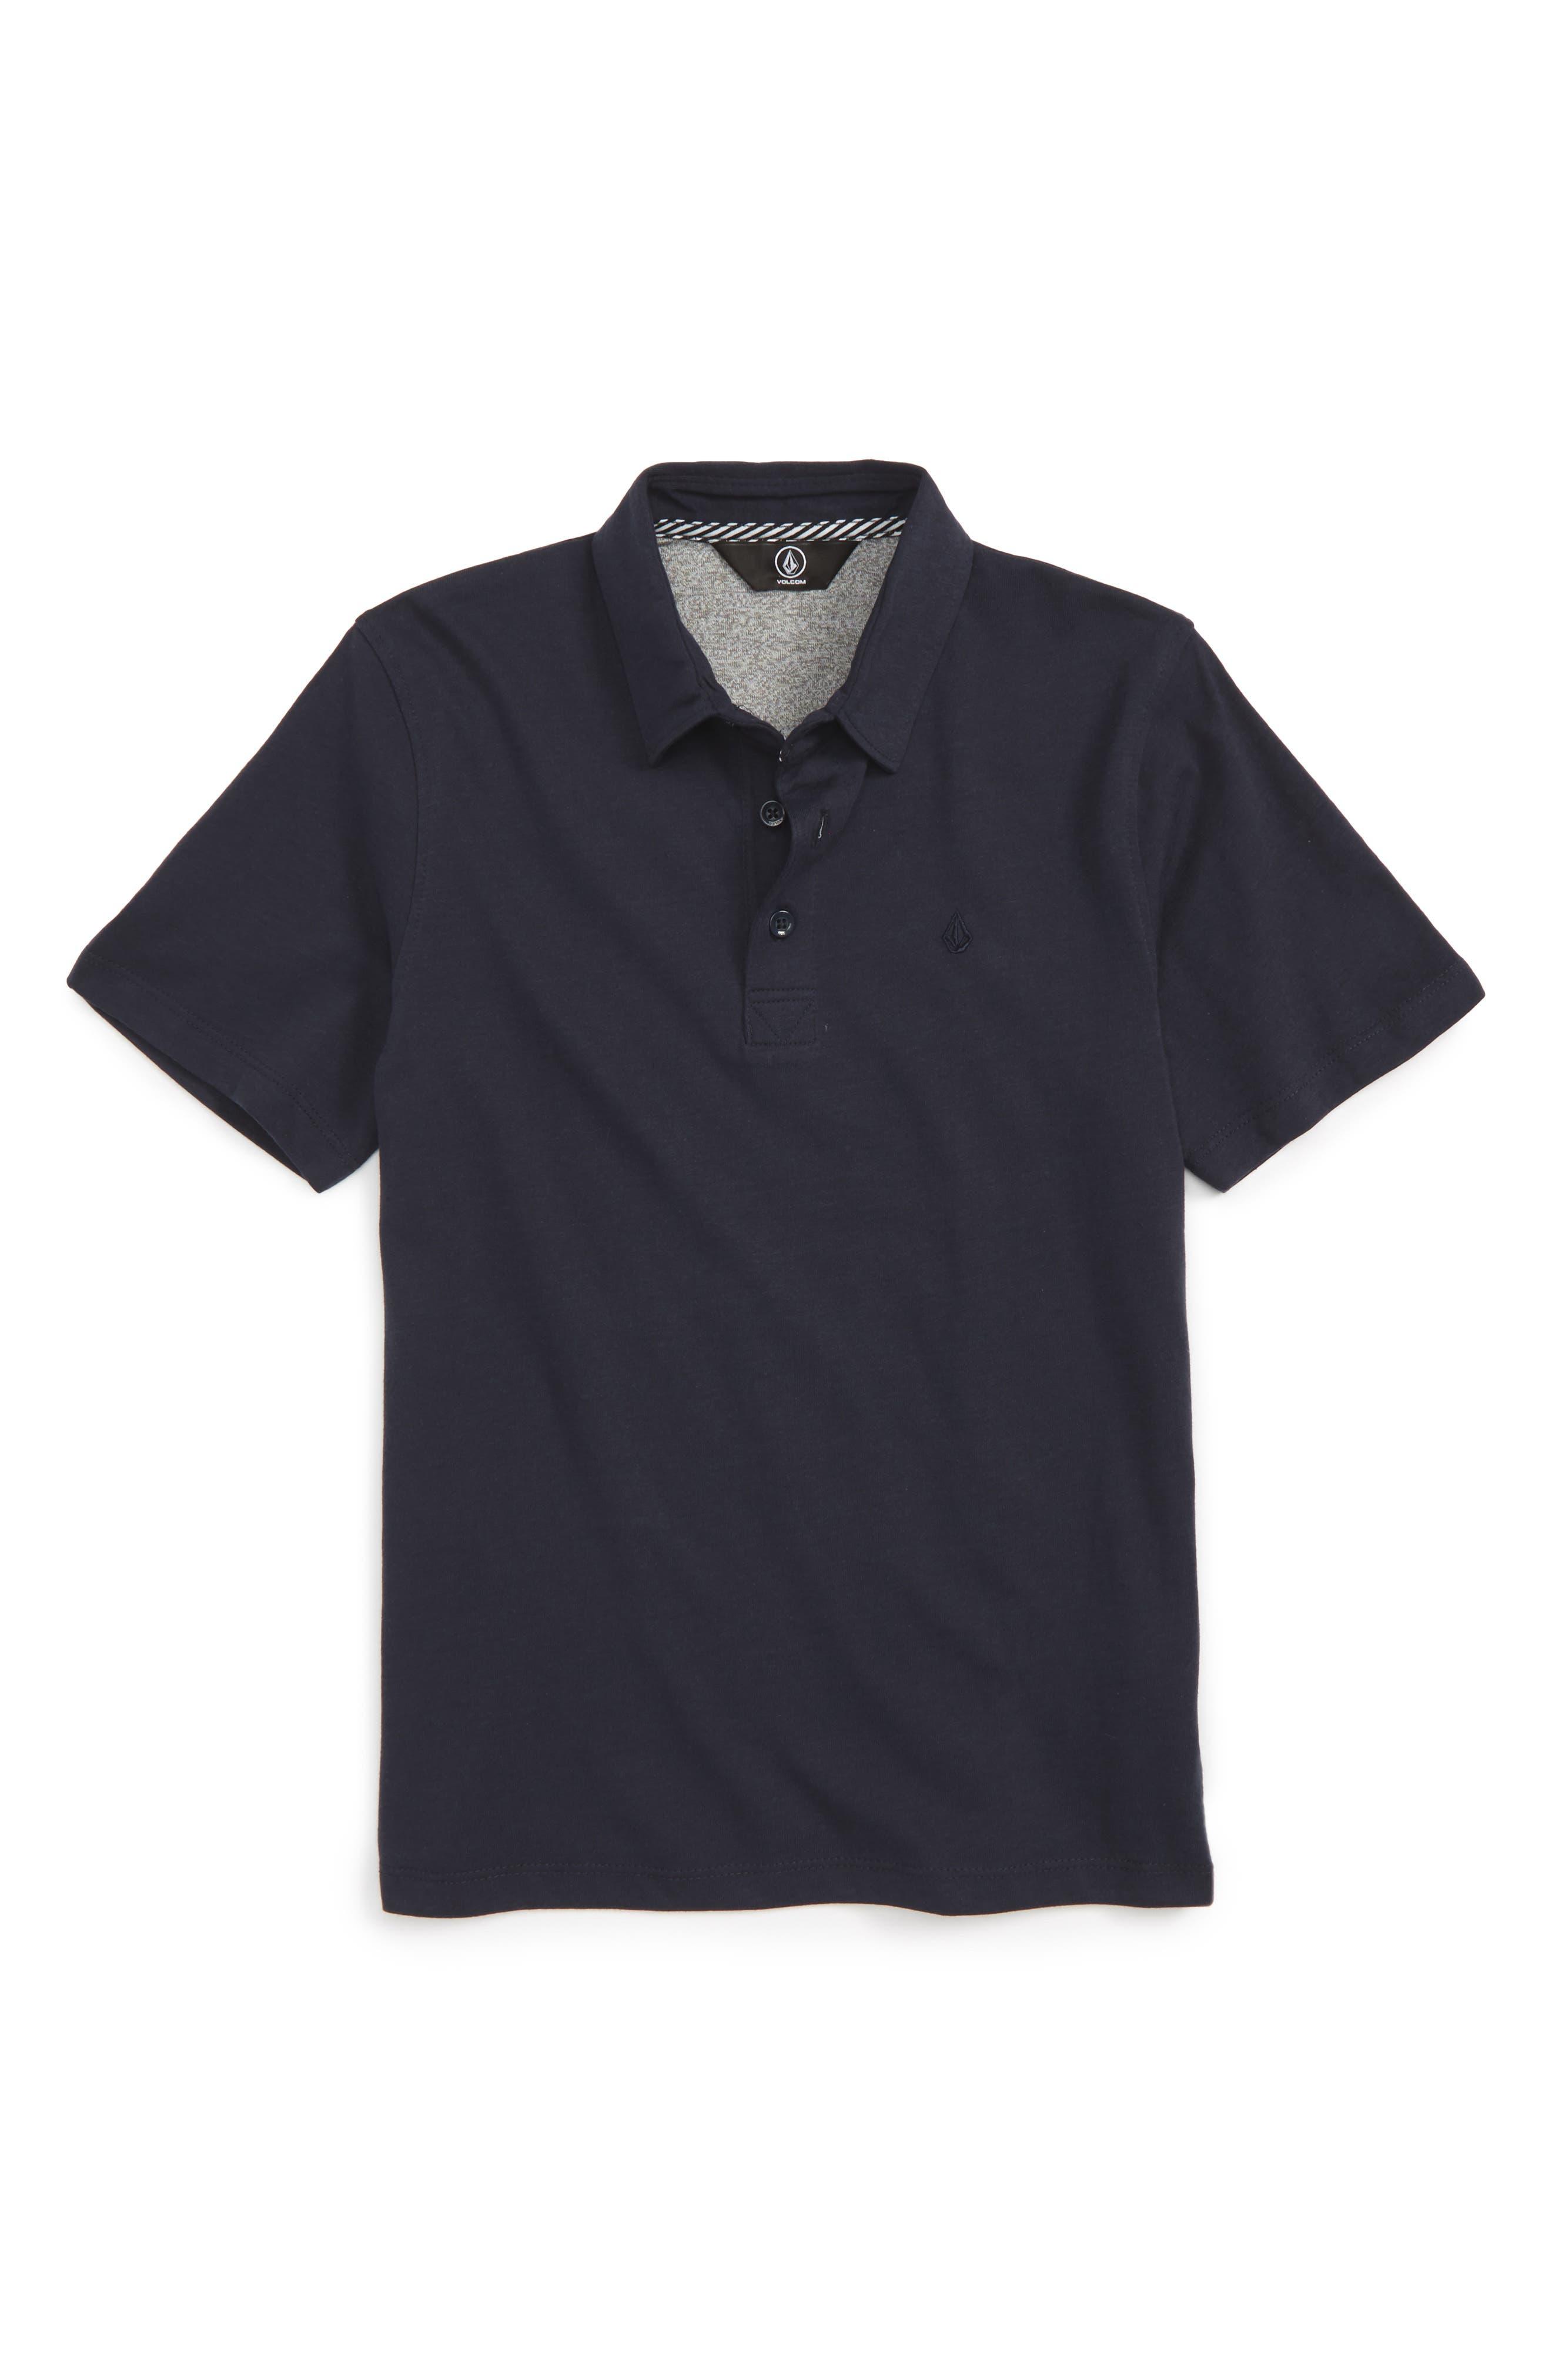 Boys Volcom Wowzer Polo Size 7  Blue